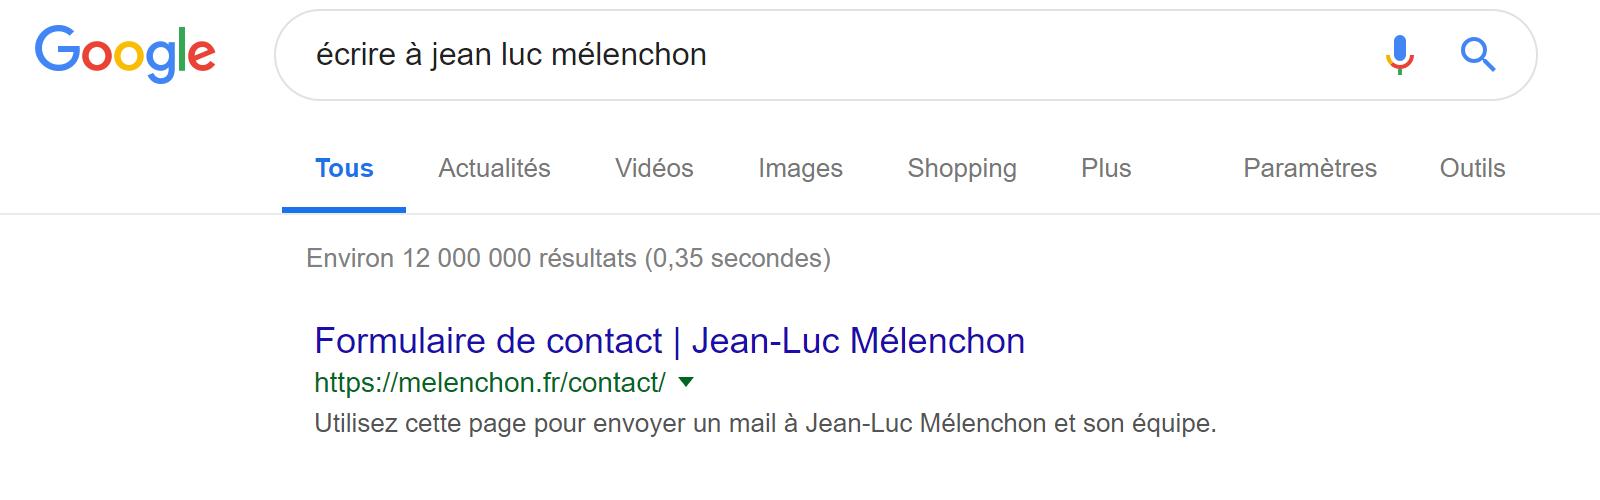 Melenchon Google